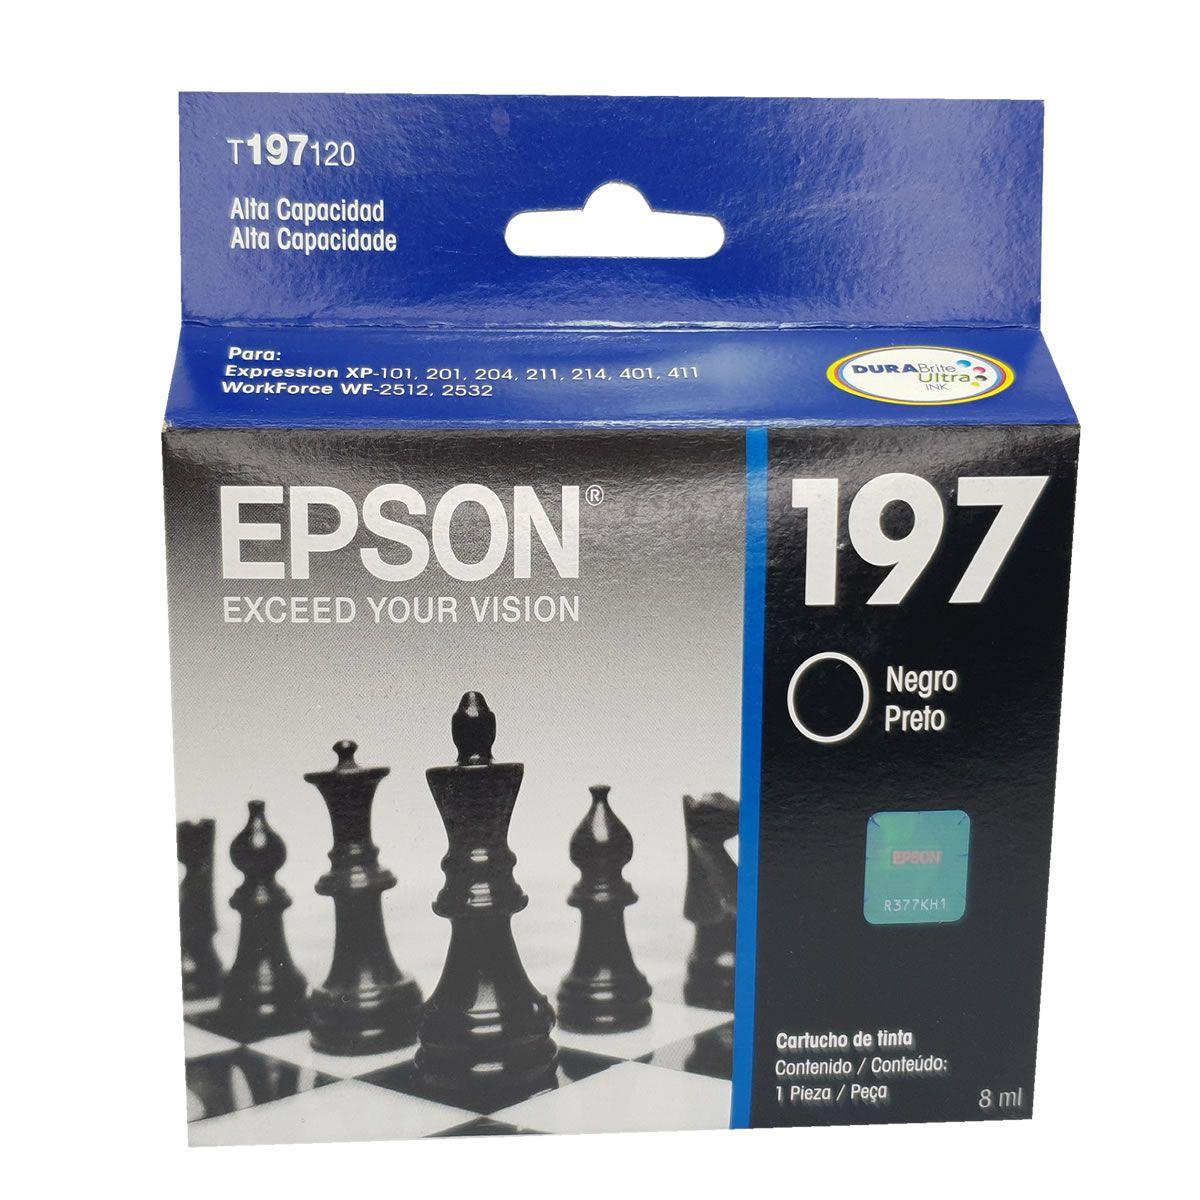 Cartucho EPSON T197120 T197 197 Preto para XP-204 XP-214 XP-401 WF-2512